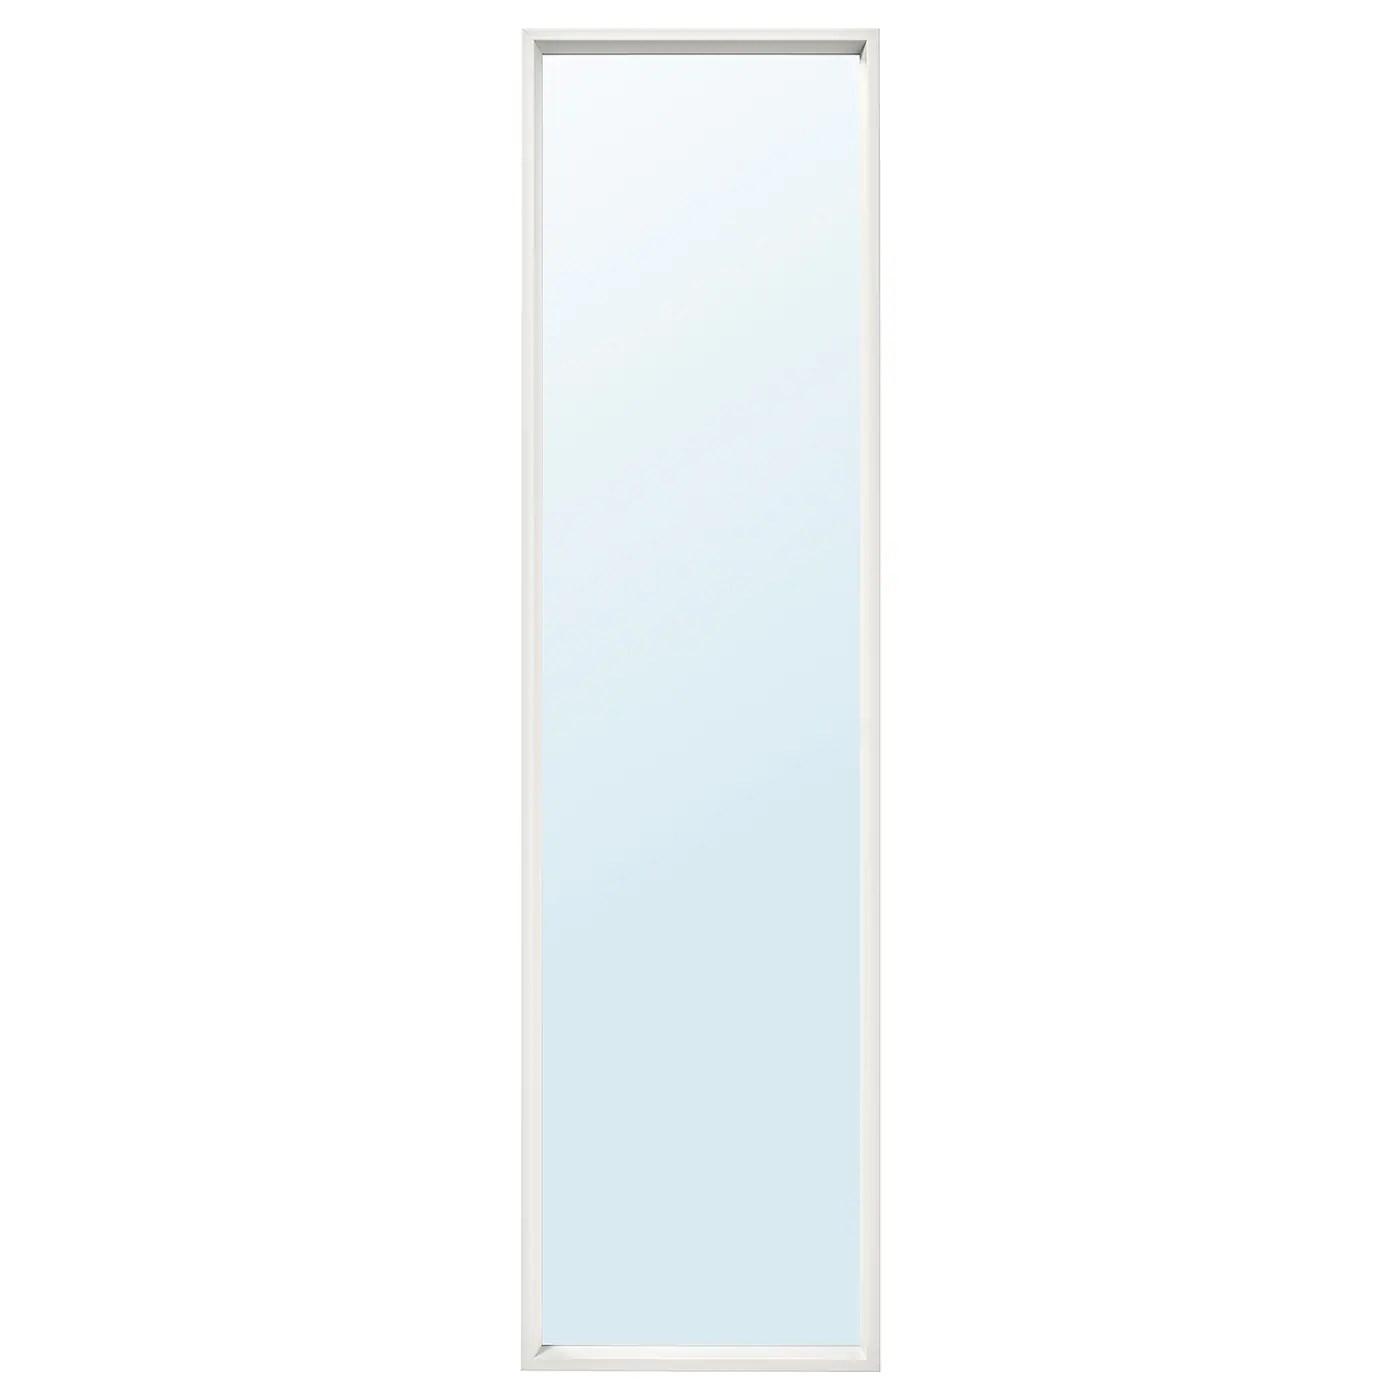 Nissedal Miroir Blanc 40x150 Cm Ikea